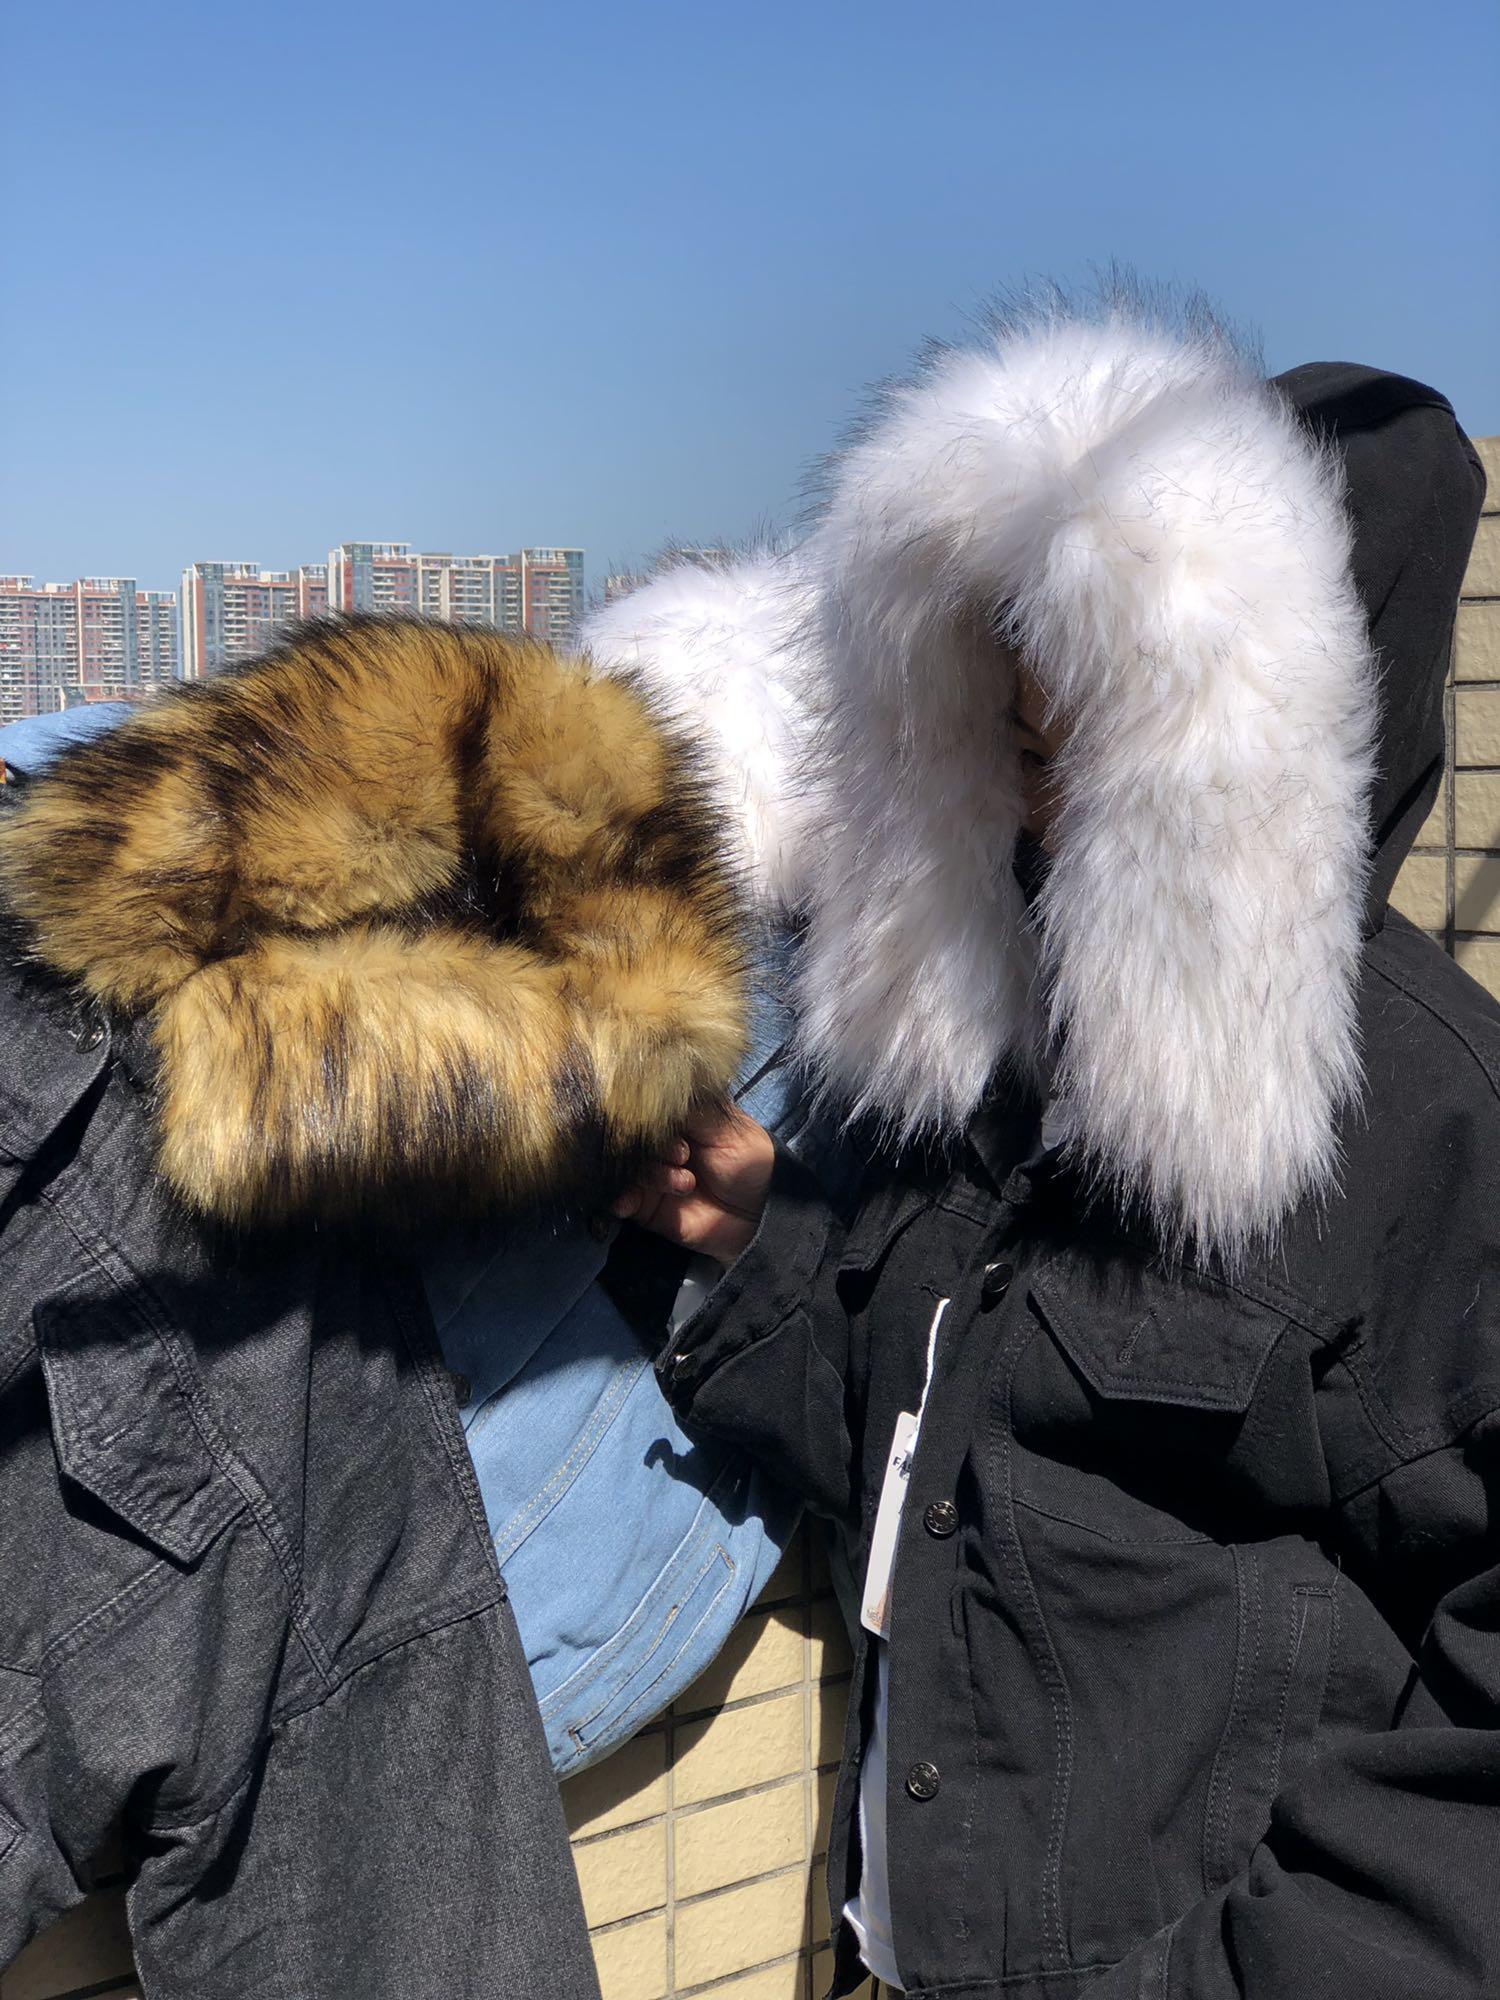 Hba0670433ca04a00bc45089acb9cd363W LUZUZI 2019 New Warm Winter Bomber Women Winter Autumn Hooded Girls Coat Jeans Denim Jackets Basic Ladies Top Windbreaker Female